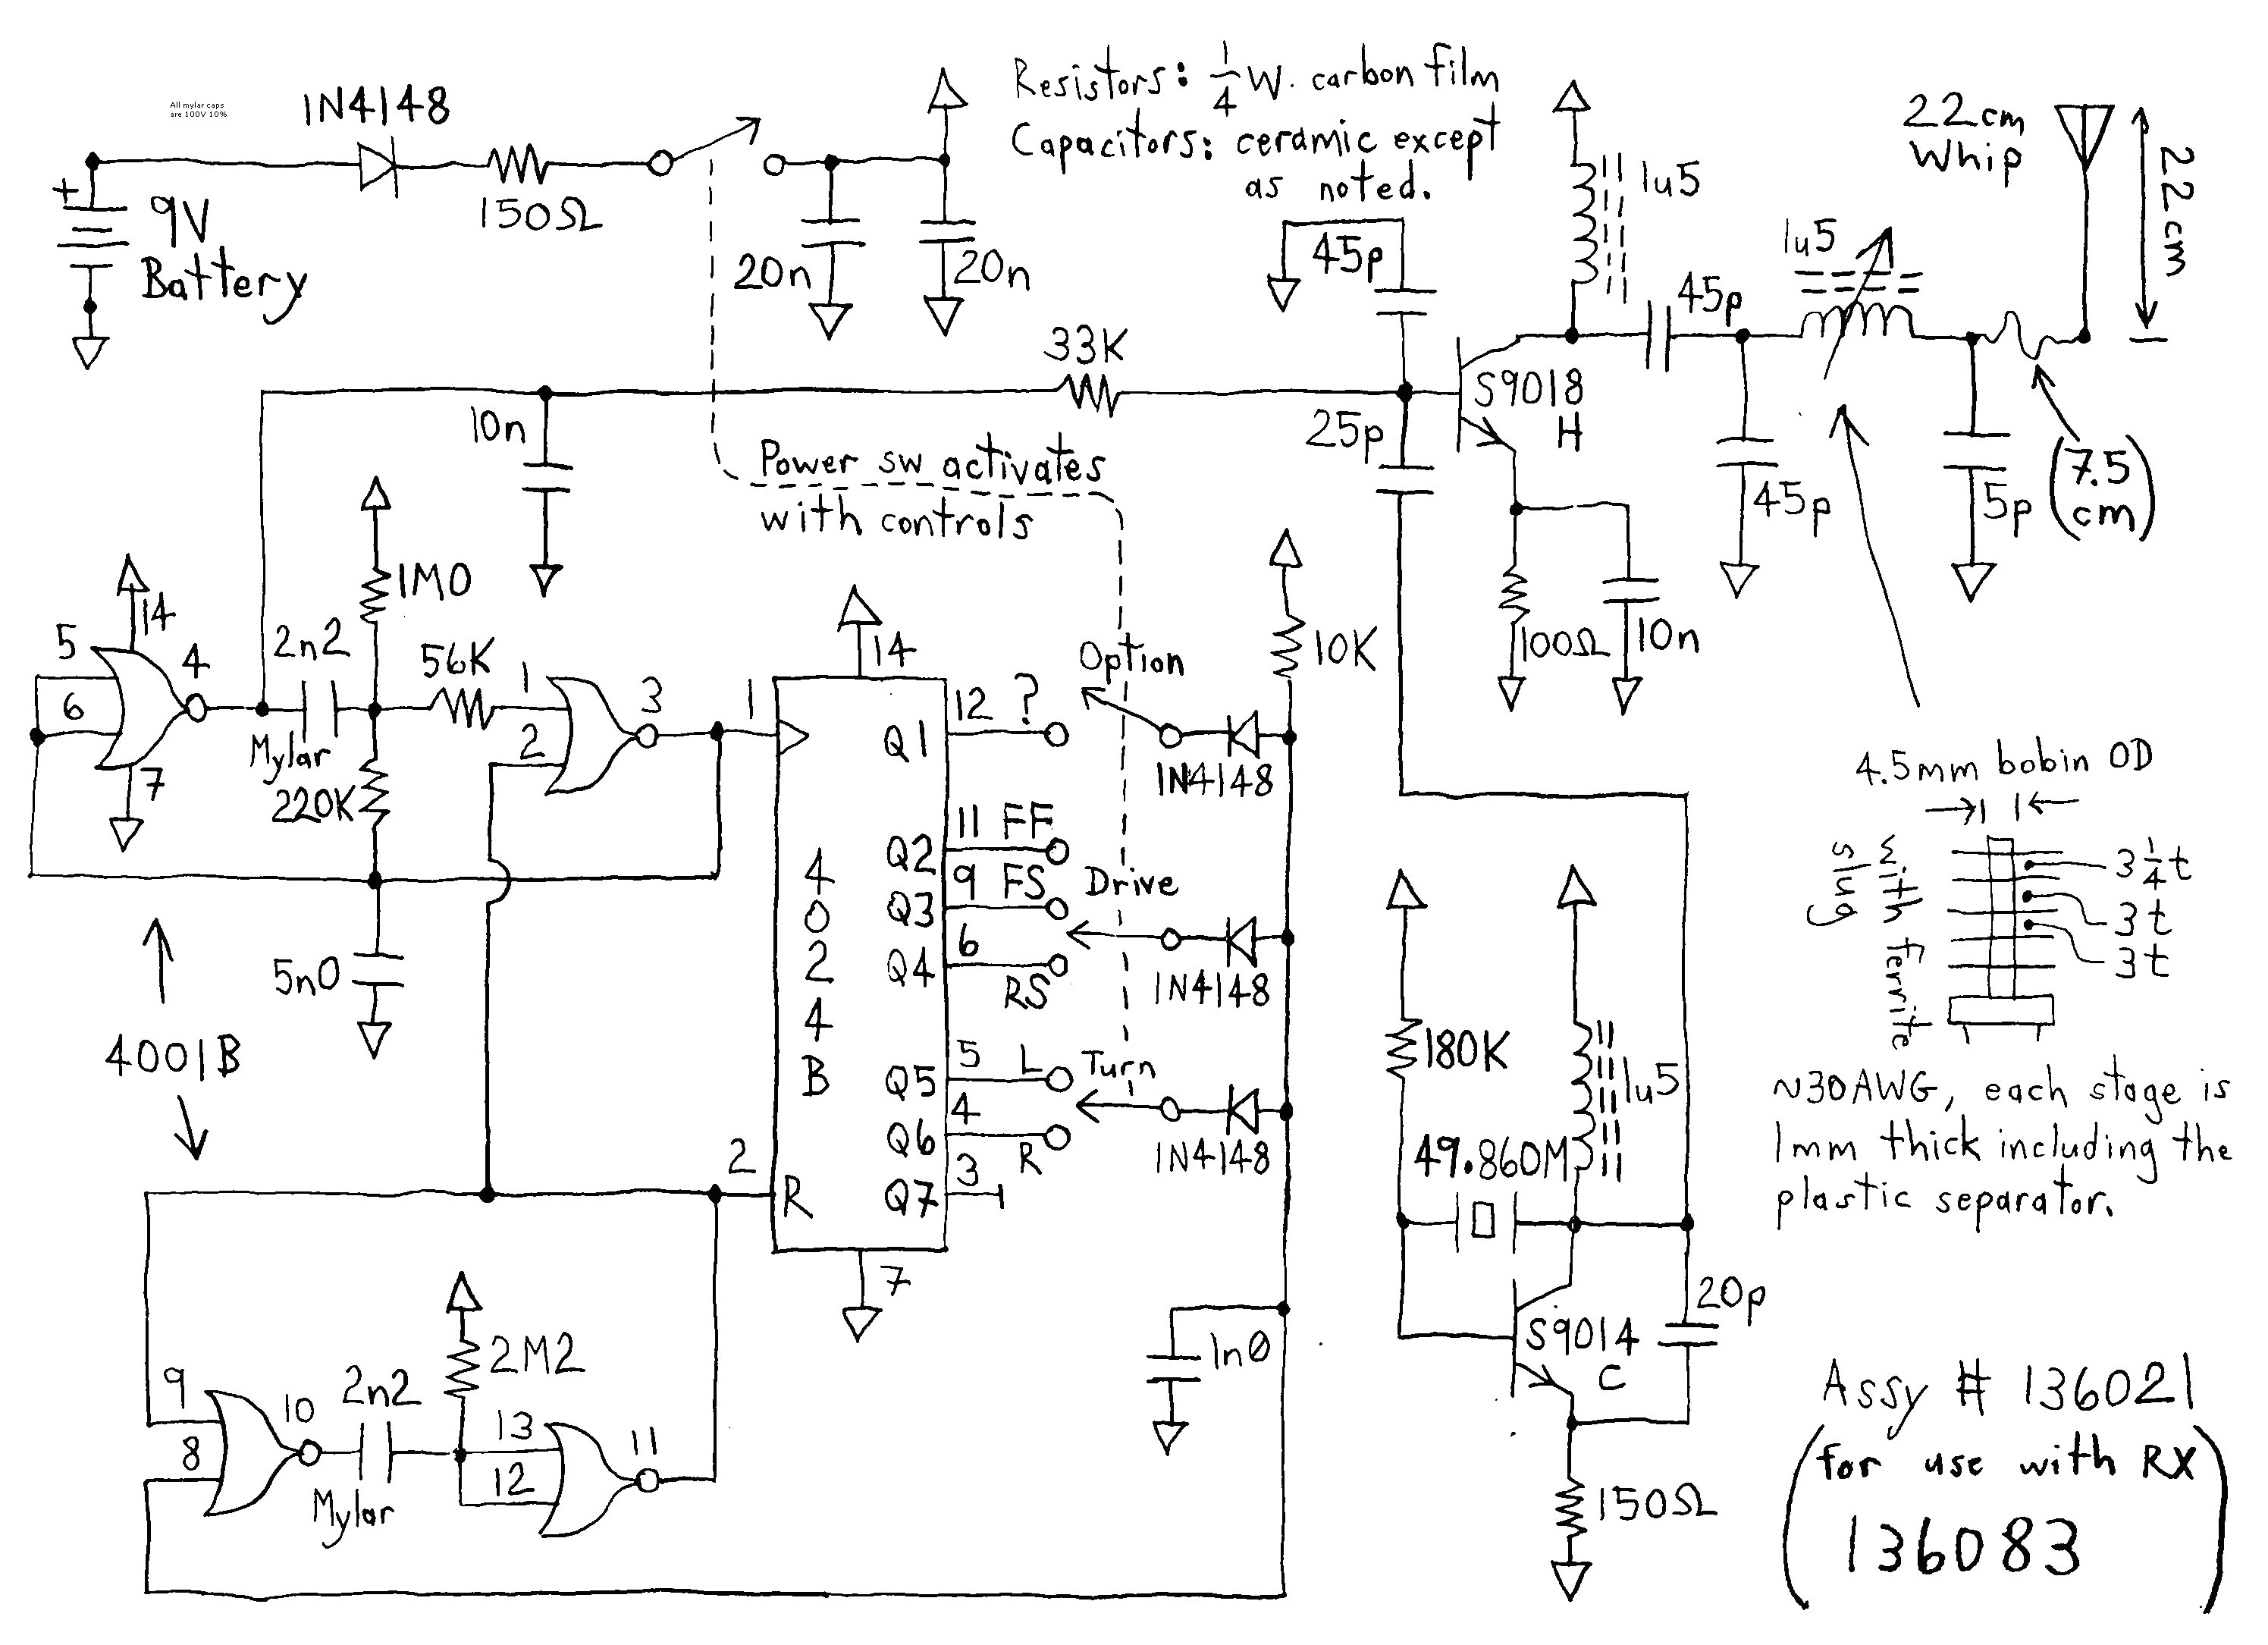 ktm wiring diagram symbols wiring library ktm wiring diagram symbols